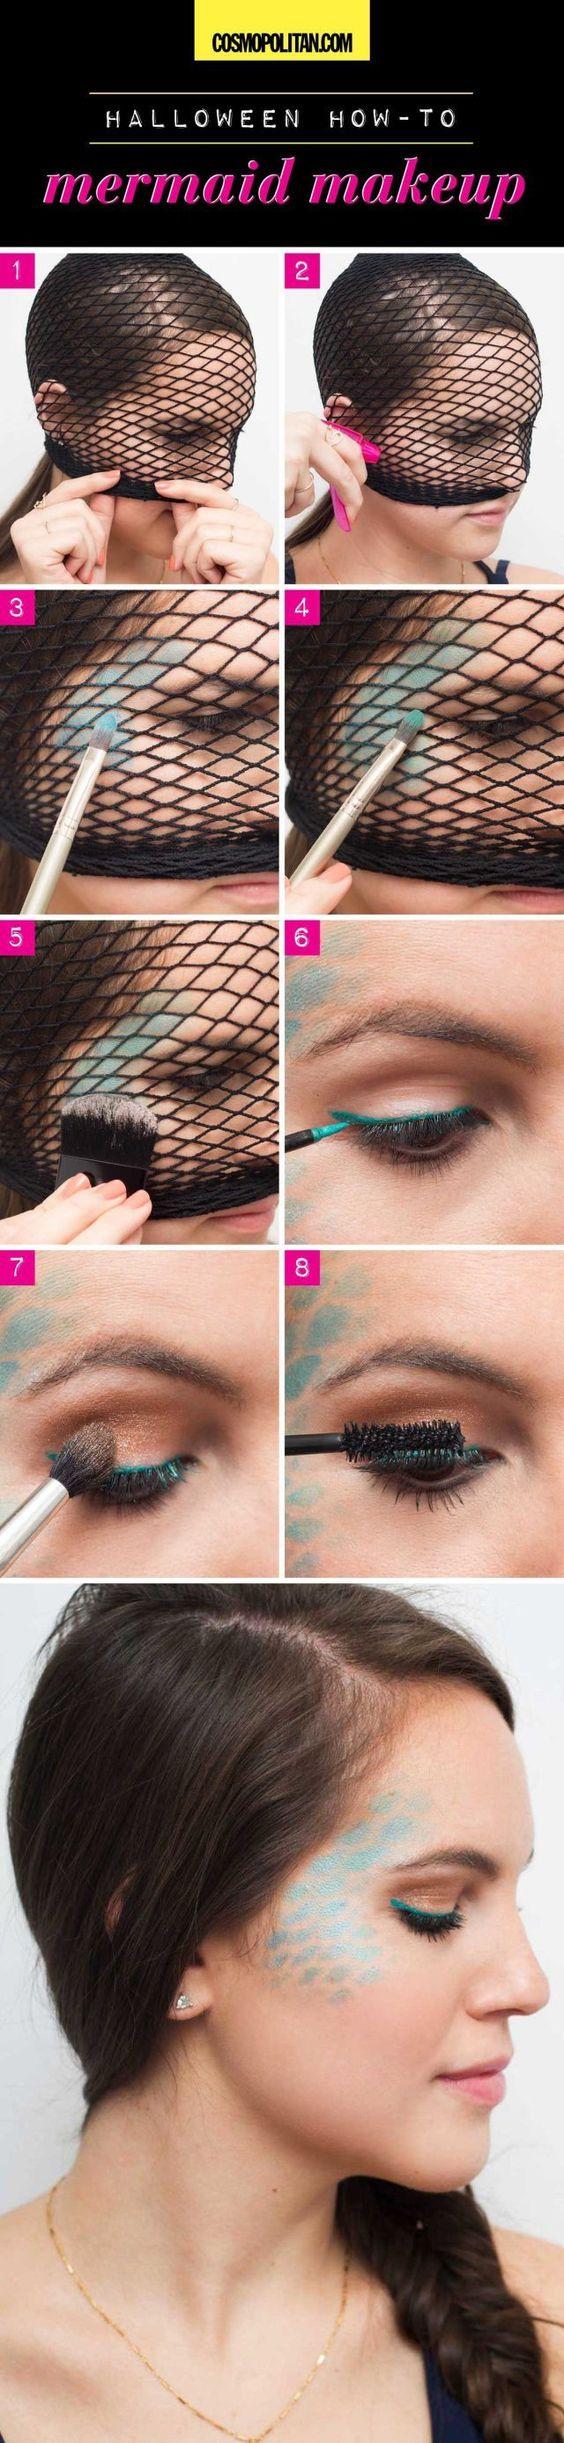 Halloween How-to: Mermaid Makeup